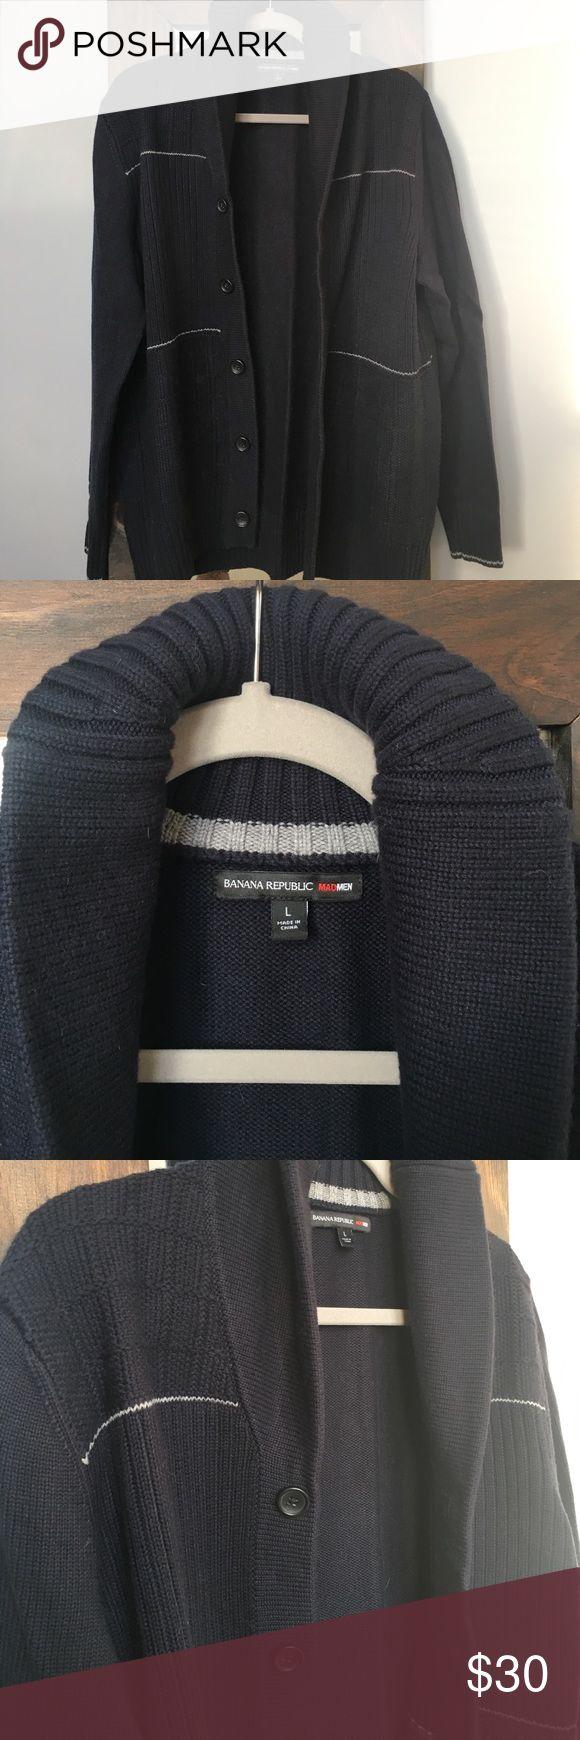 Banana Republic MAD MEN Cardigan Sweater Men's Large, Navy Blue, New With No Tags Banana Republic Sweaters Cardigan